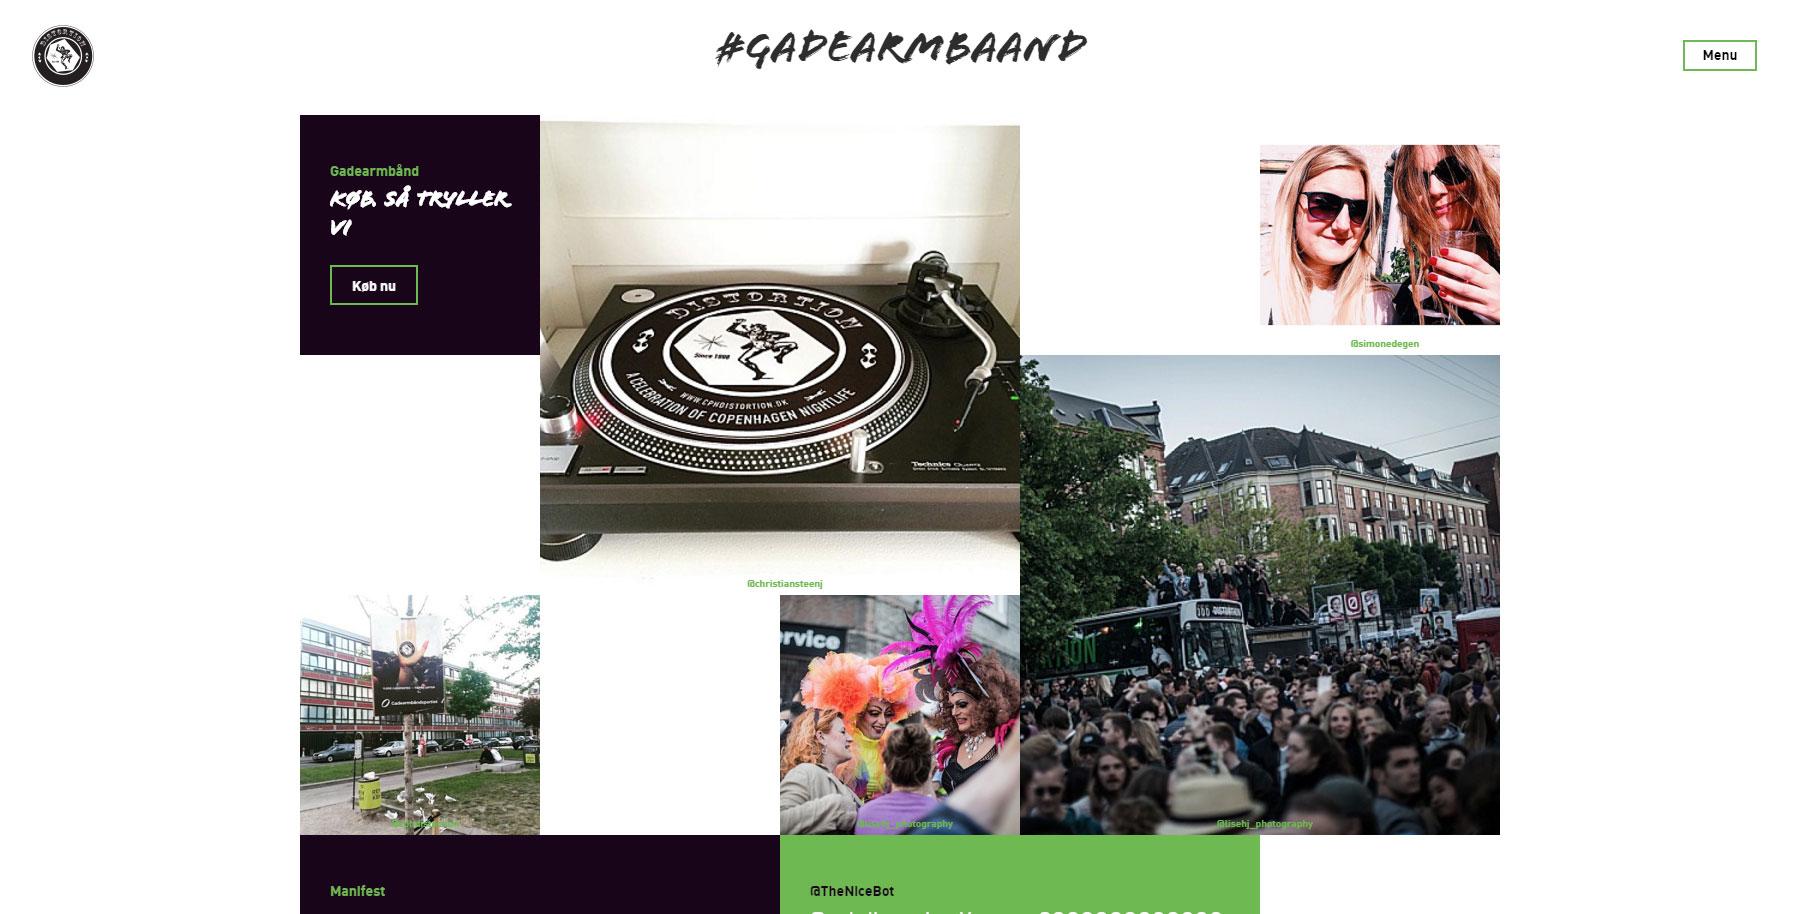 Distortion Gadearmbaand - Website of the Day